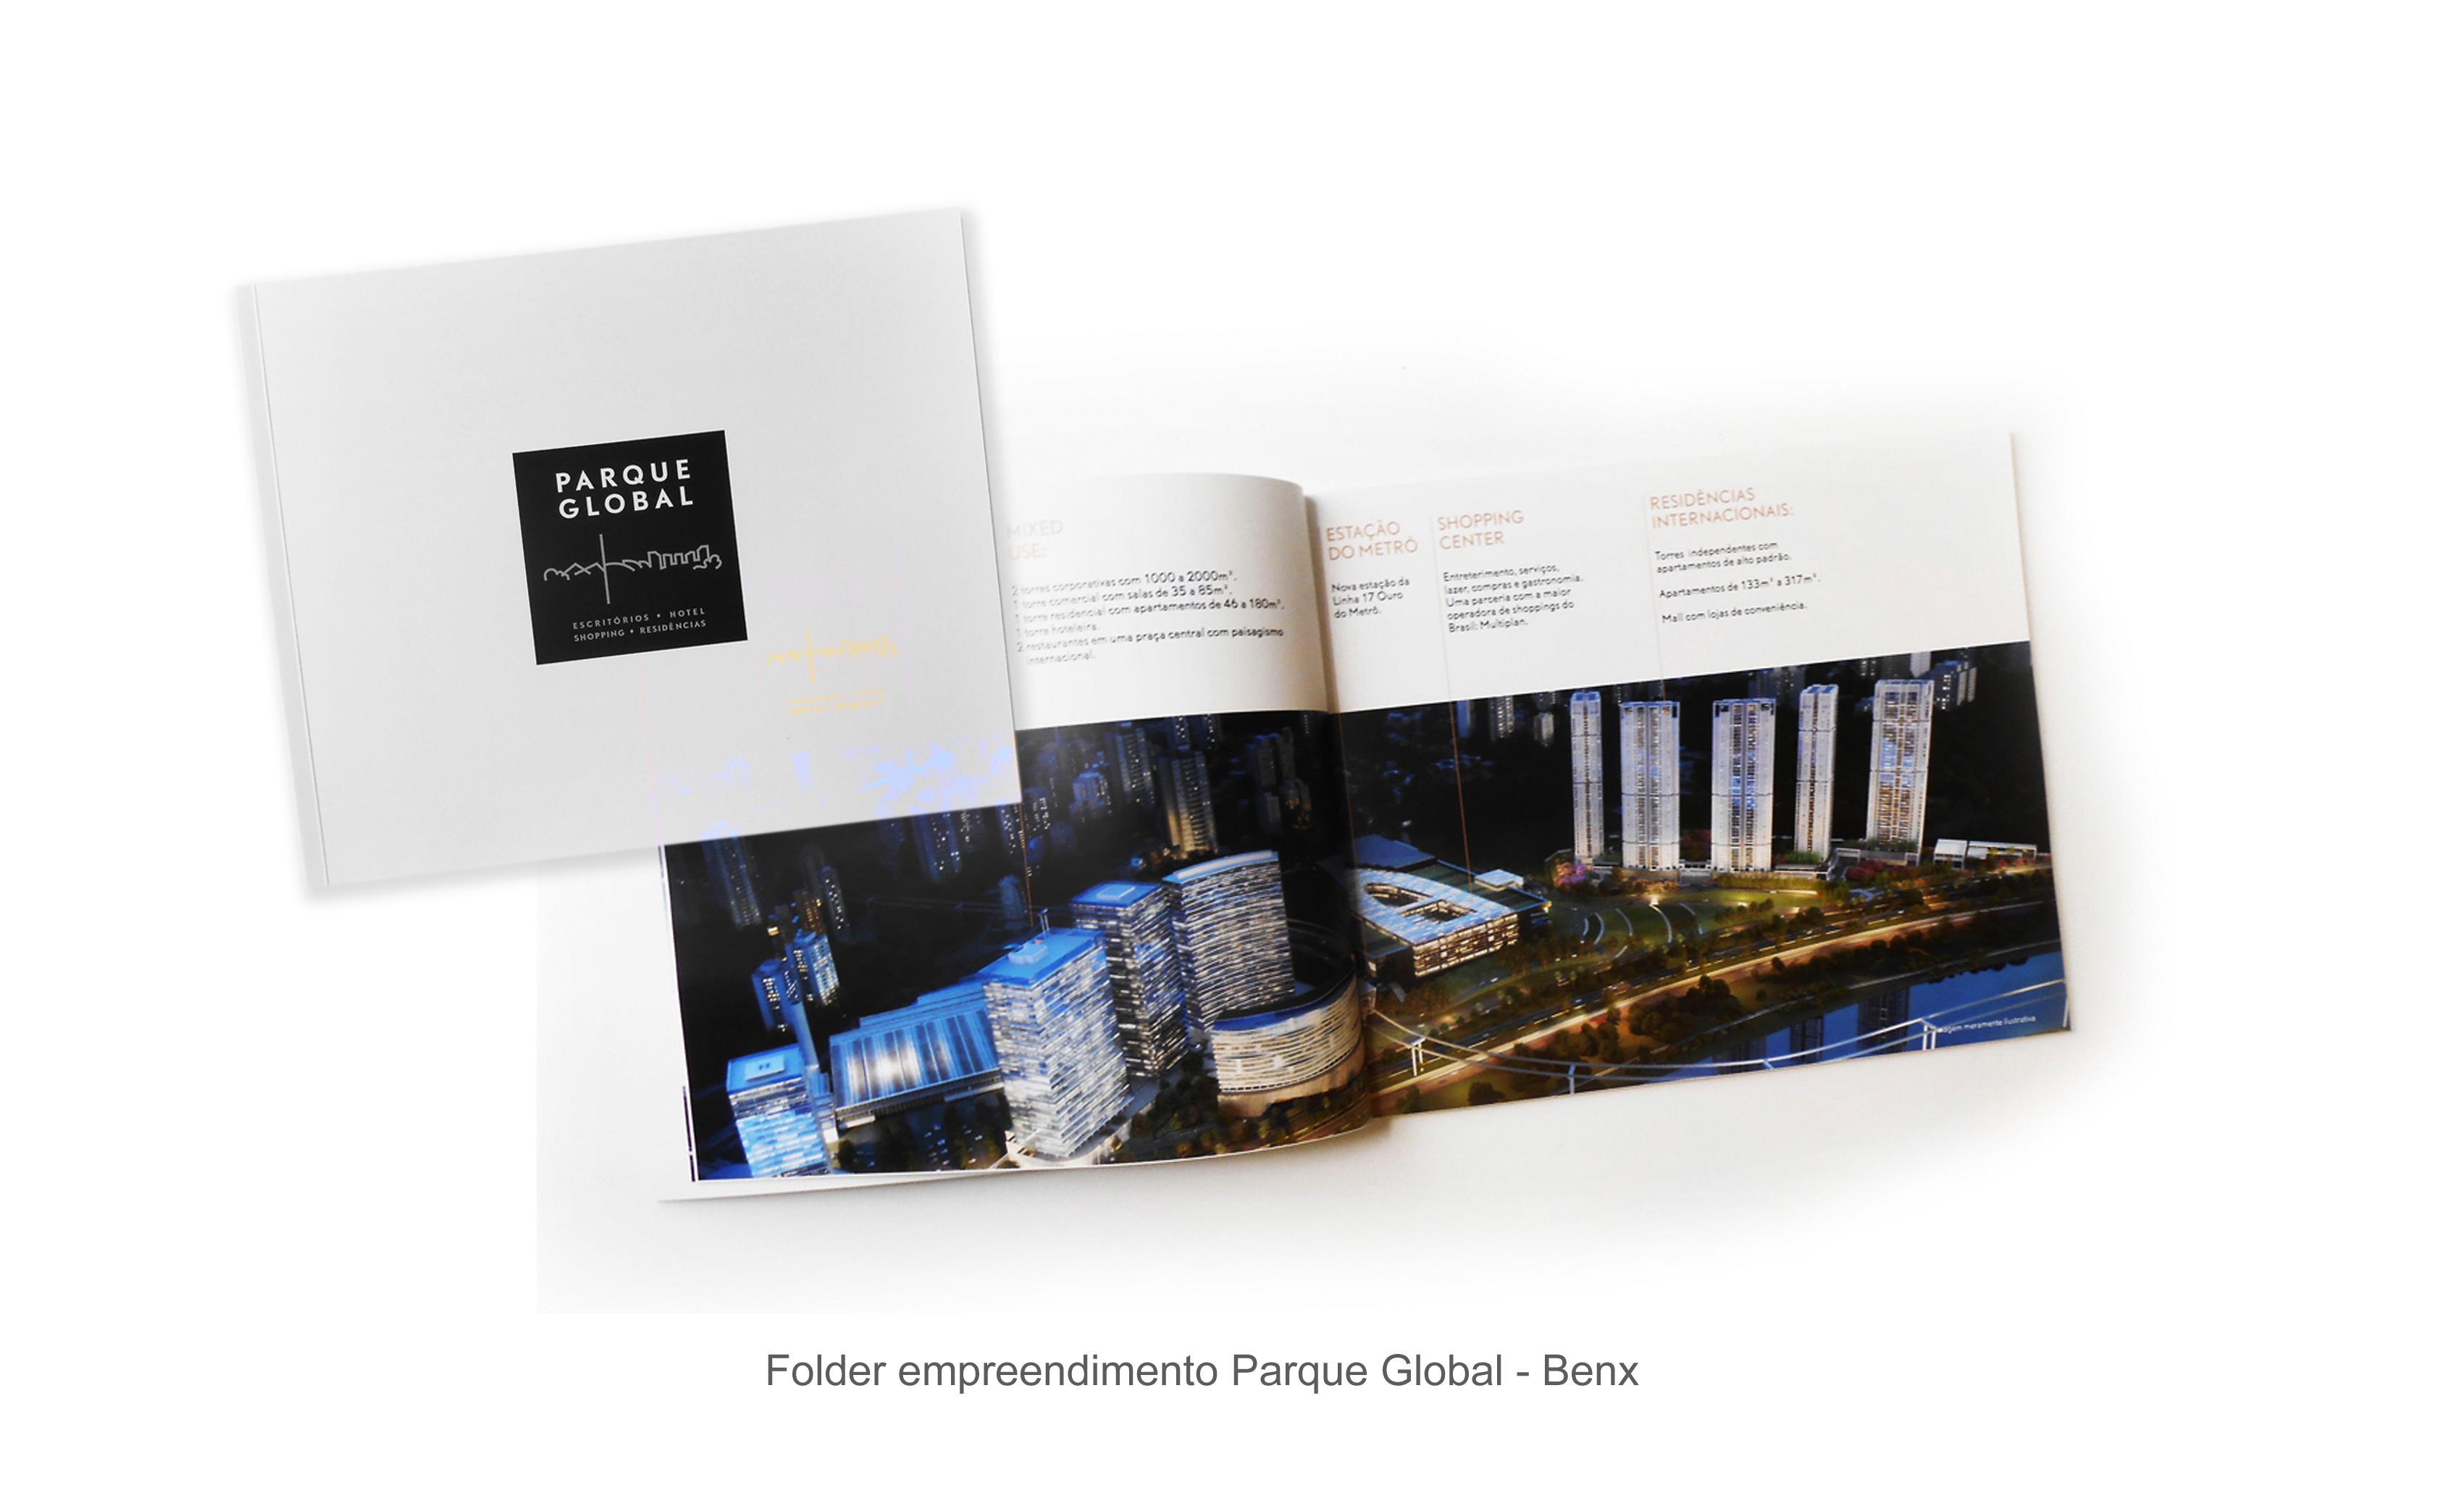 Empreendimento Parque Global